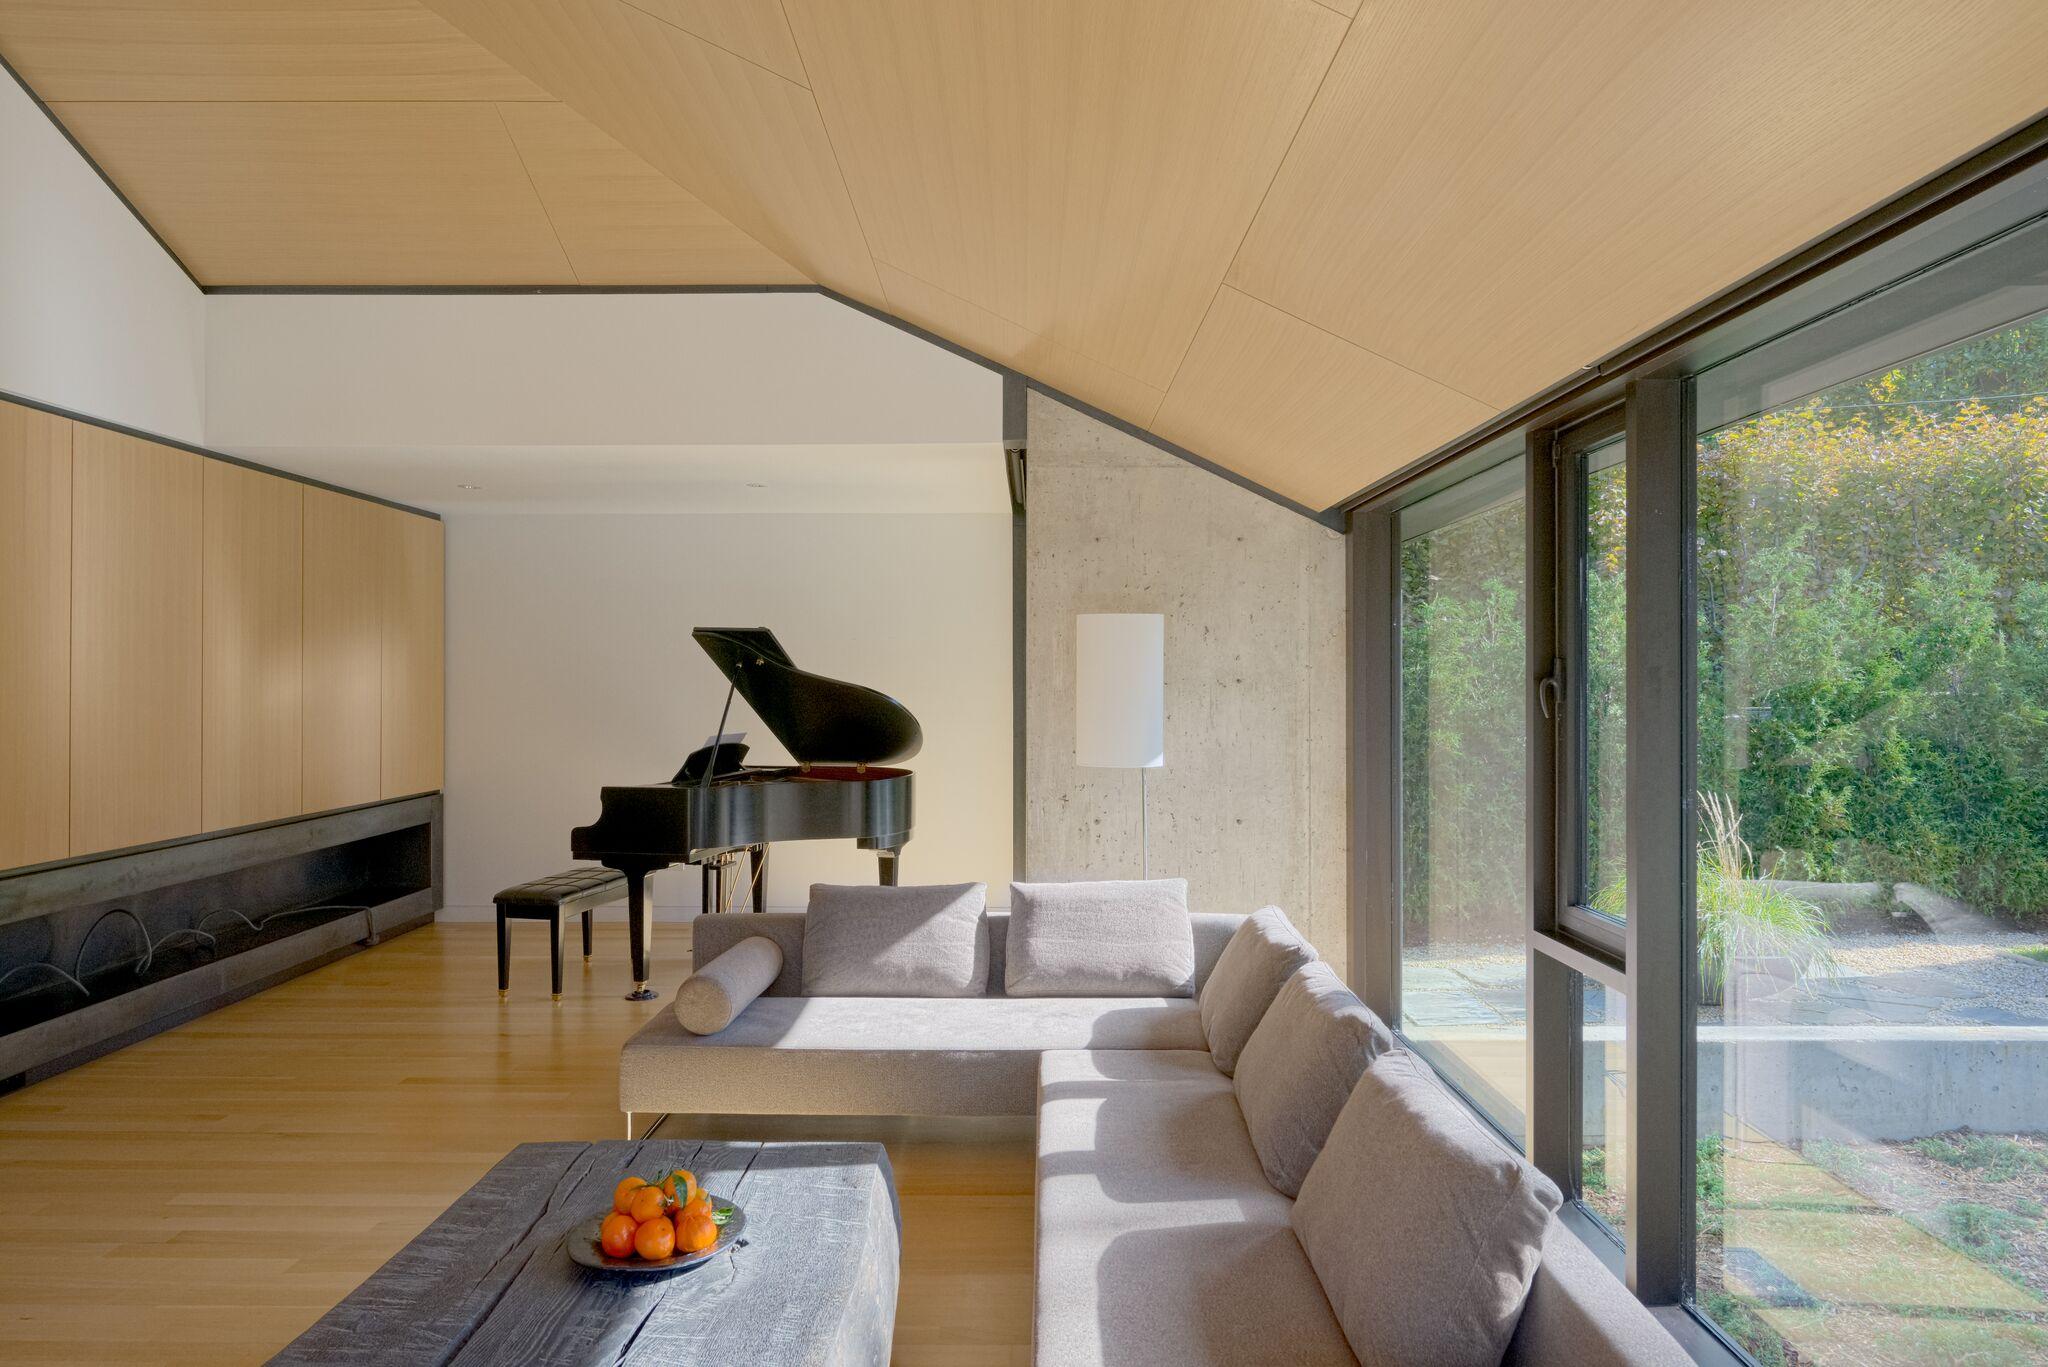 Abenbare House Interior Living Room